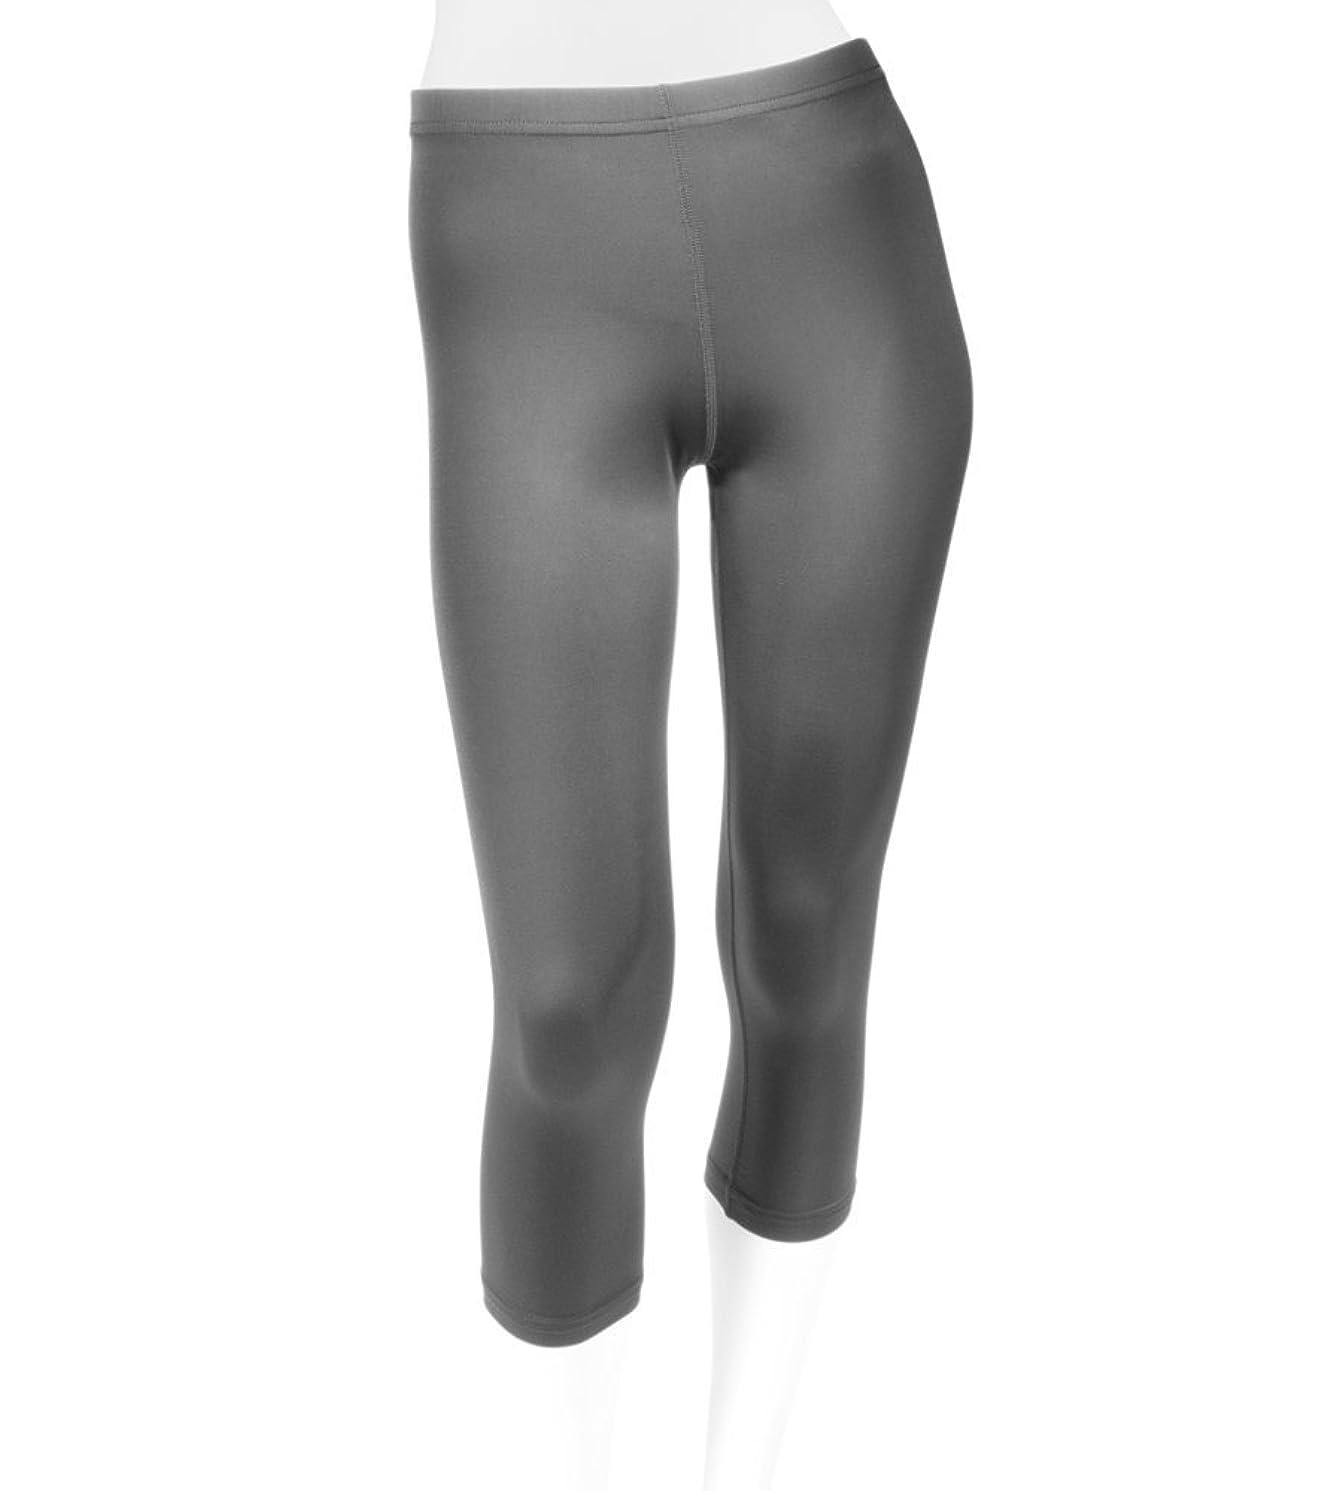 AERO|TECH|DESIGNS ATD Plus Women's Cycling Knickers Padded Spandex Capri - Made in USA